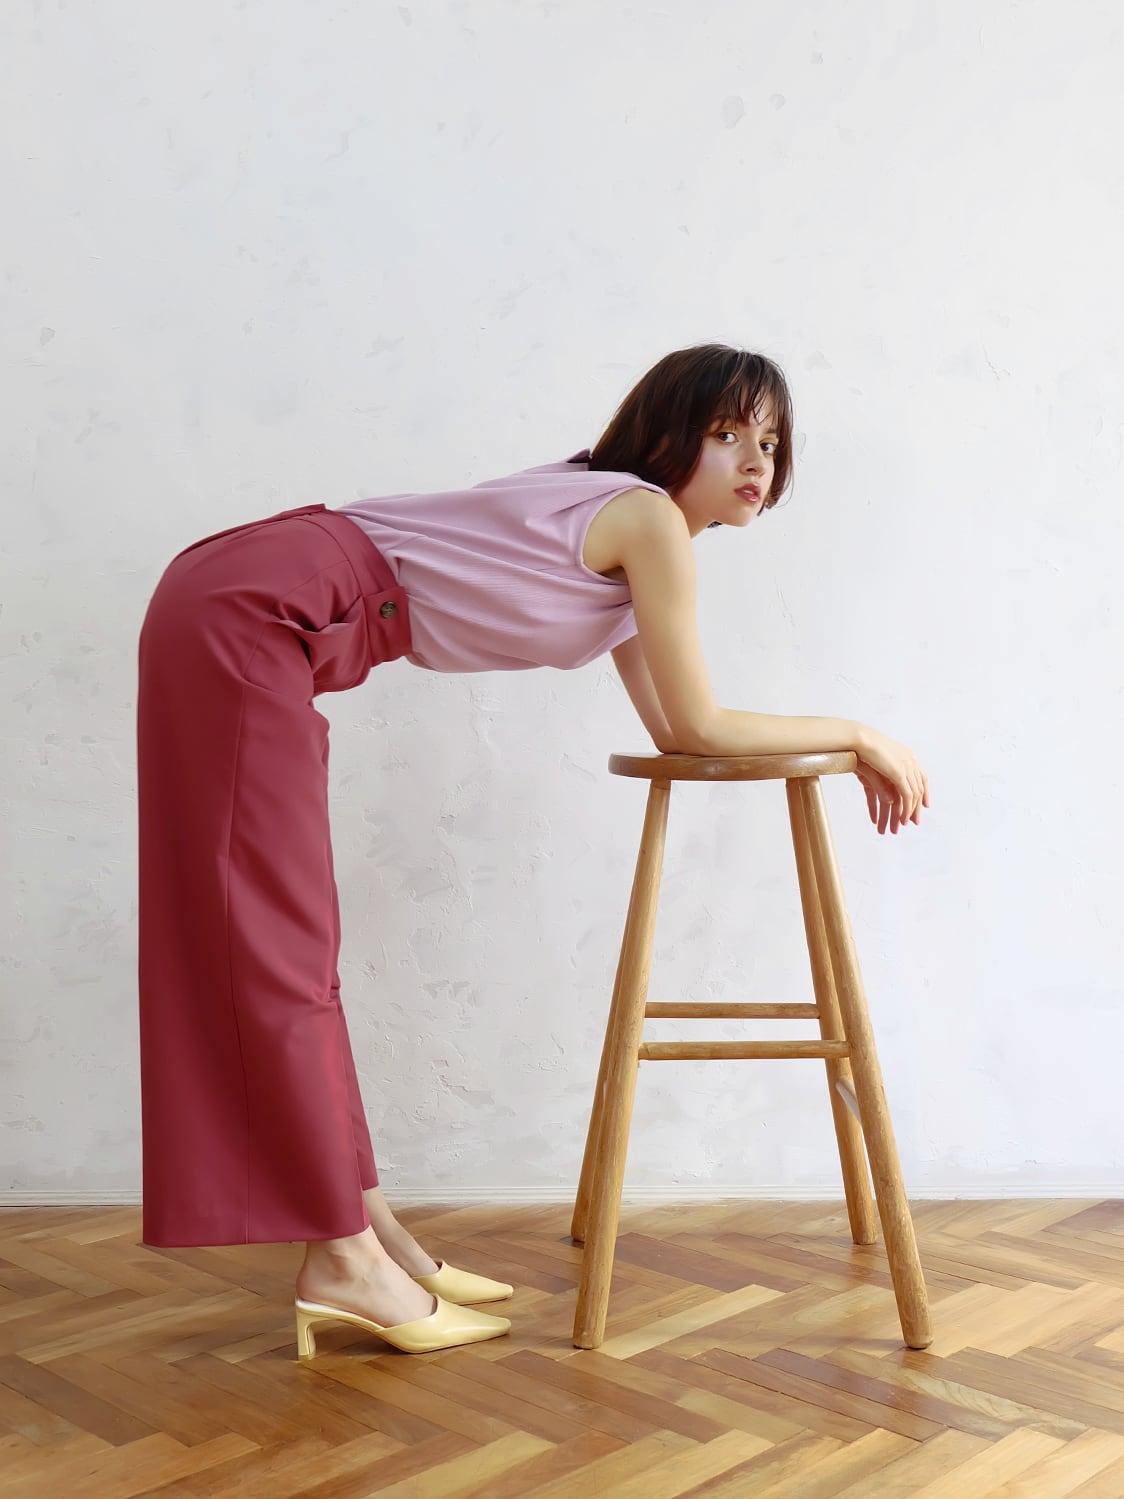 color wide slacks(raspberry)